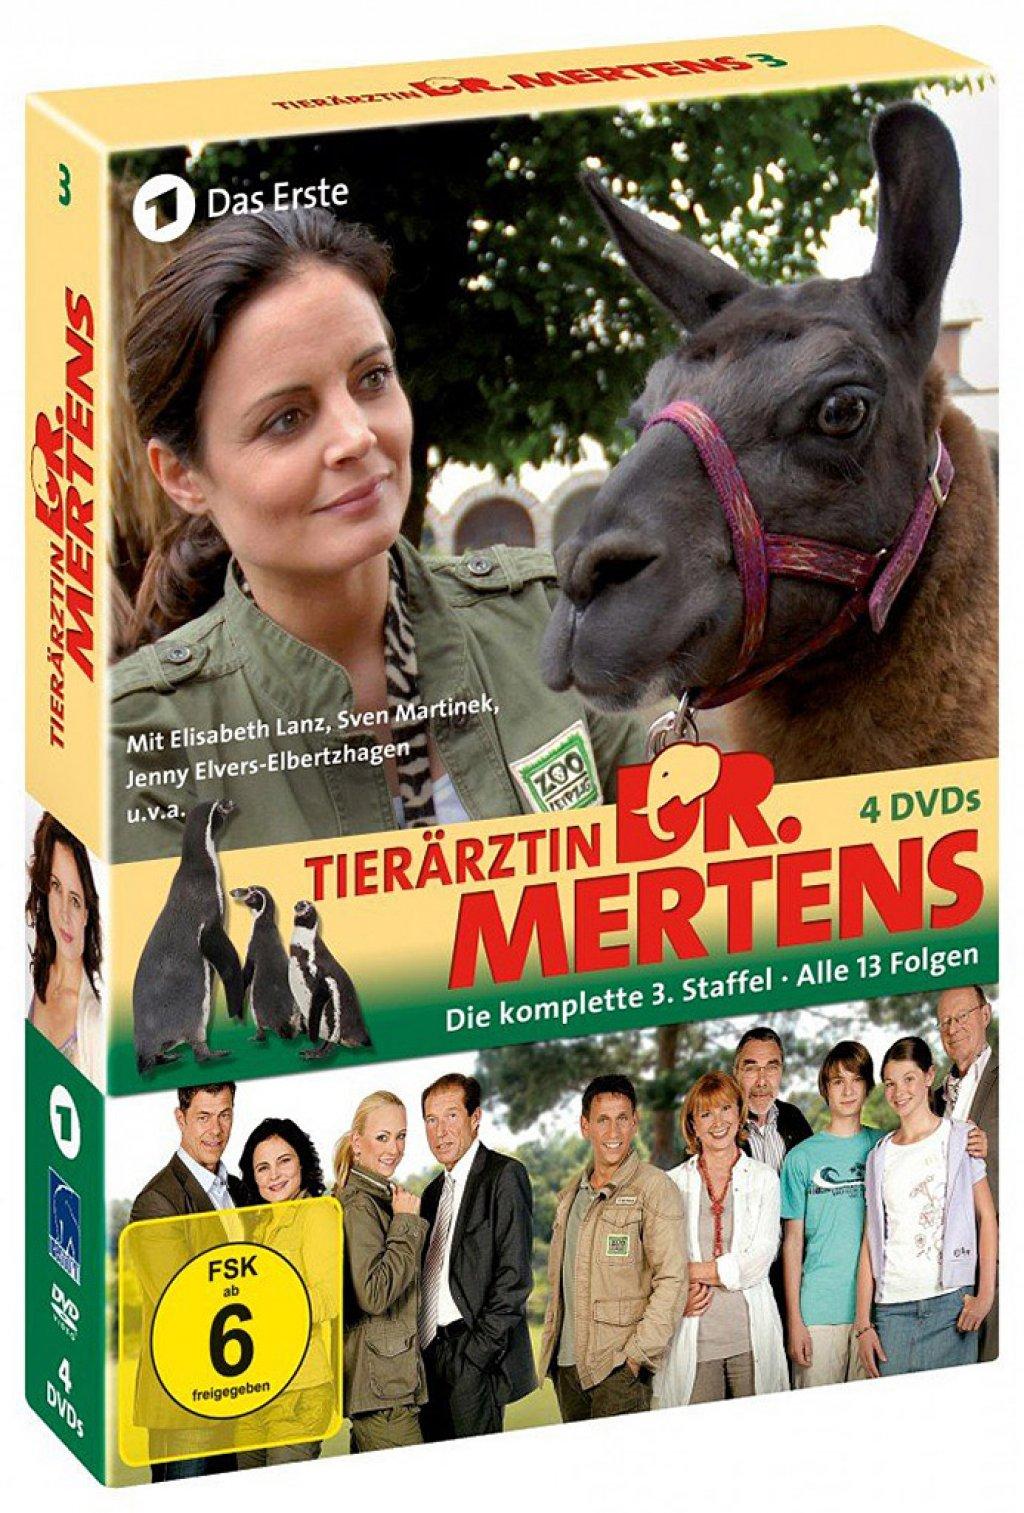 Tierärztin Dr. Mertens - Staffel 3 (DVD)